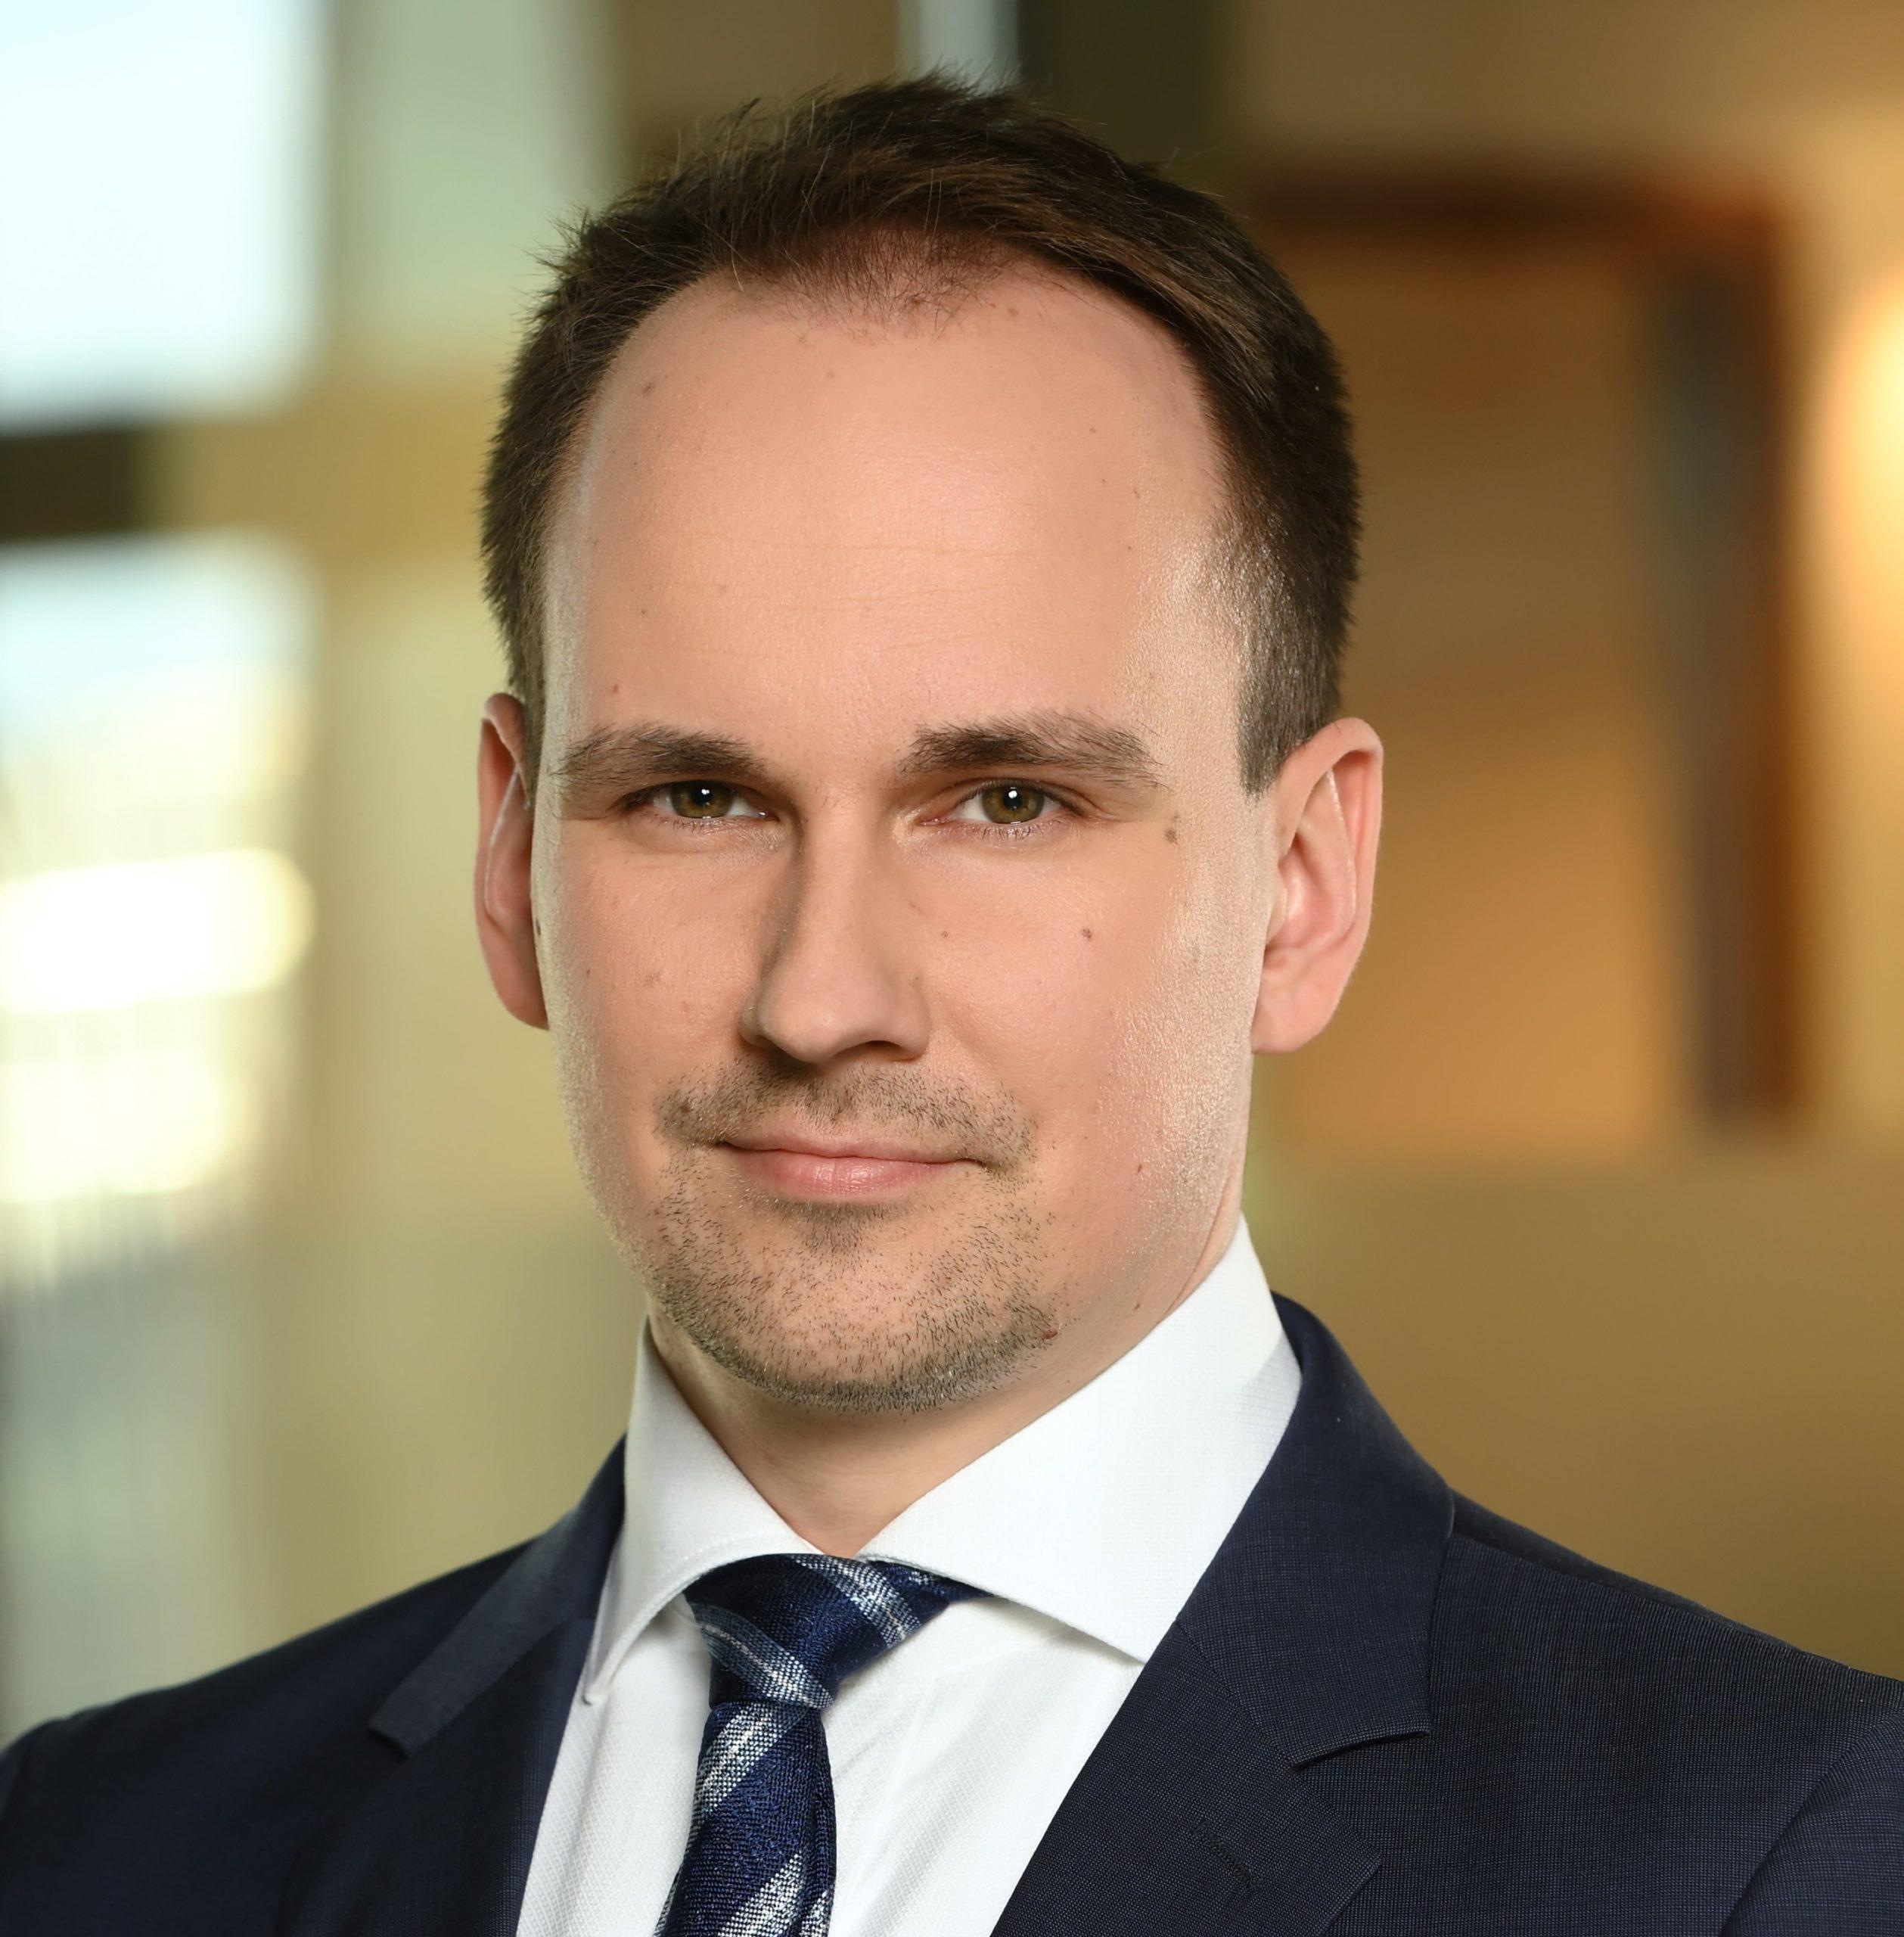 Damian Staszewski